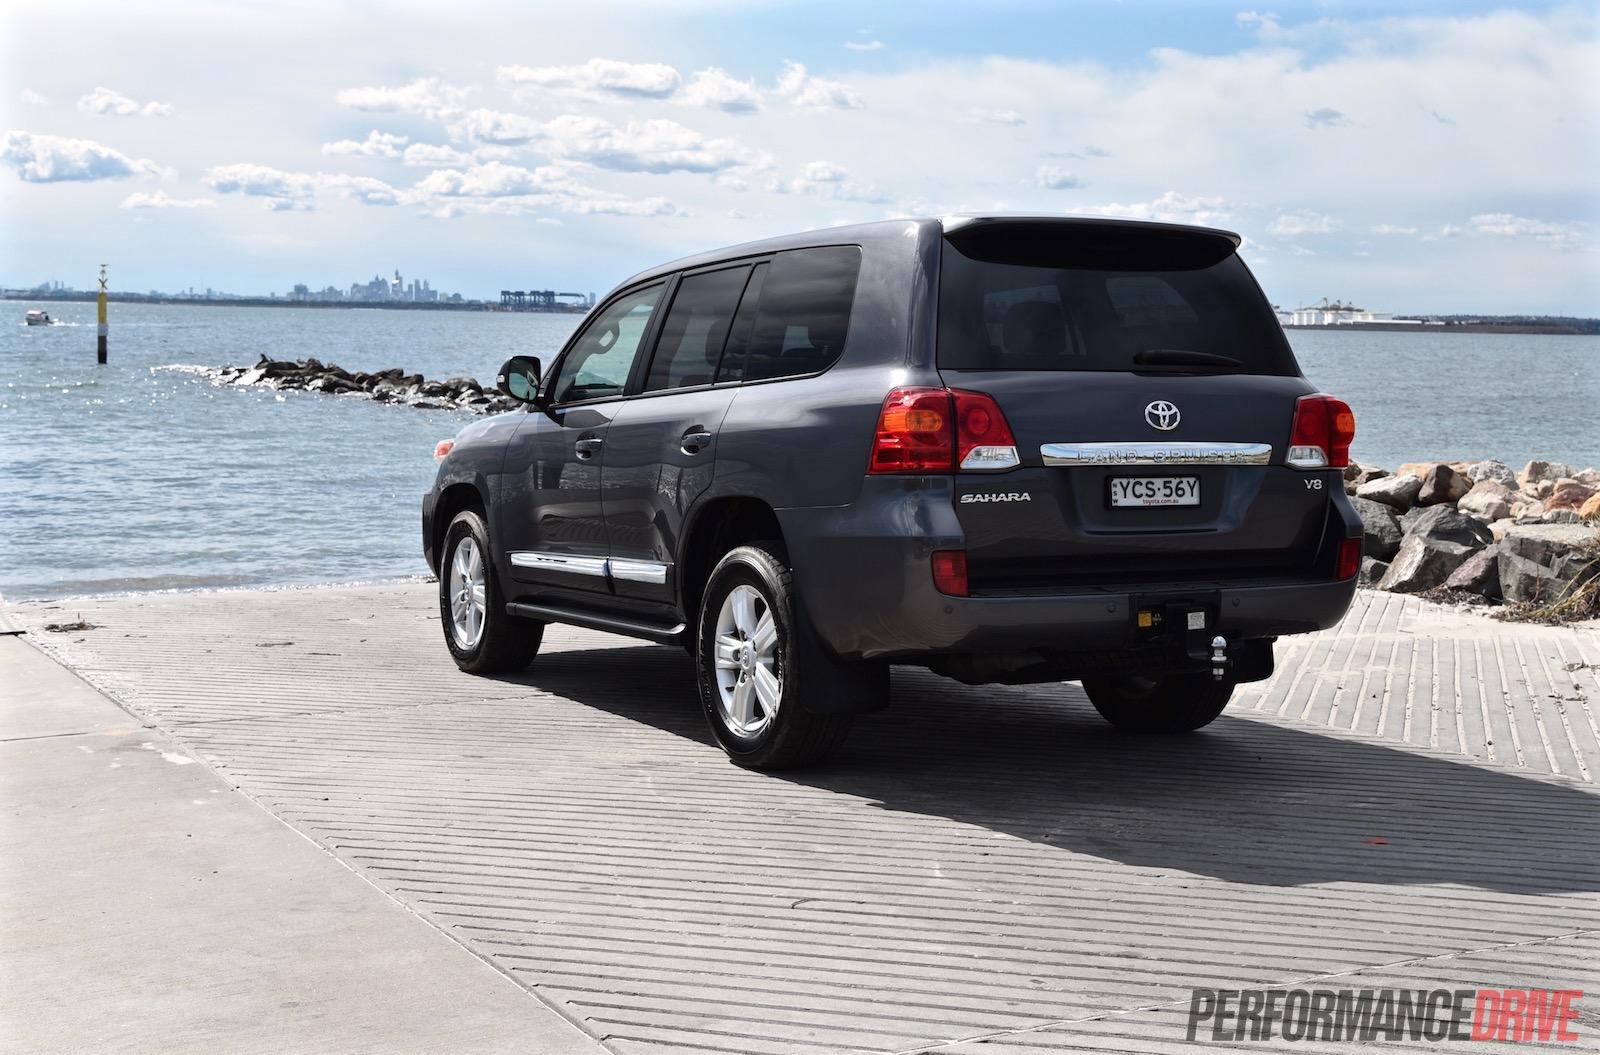 2015 Toyota Landcruiser Sahara Diesel Review Video Performancedrive